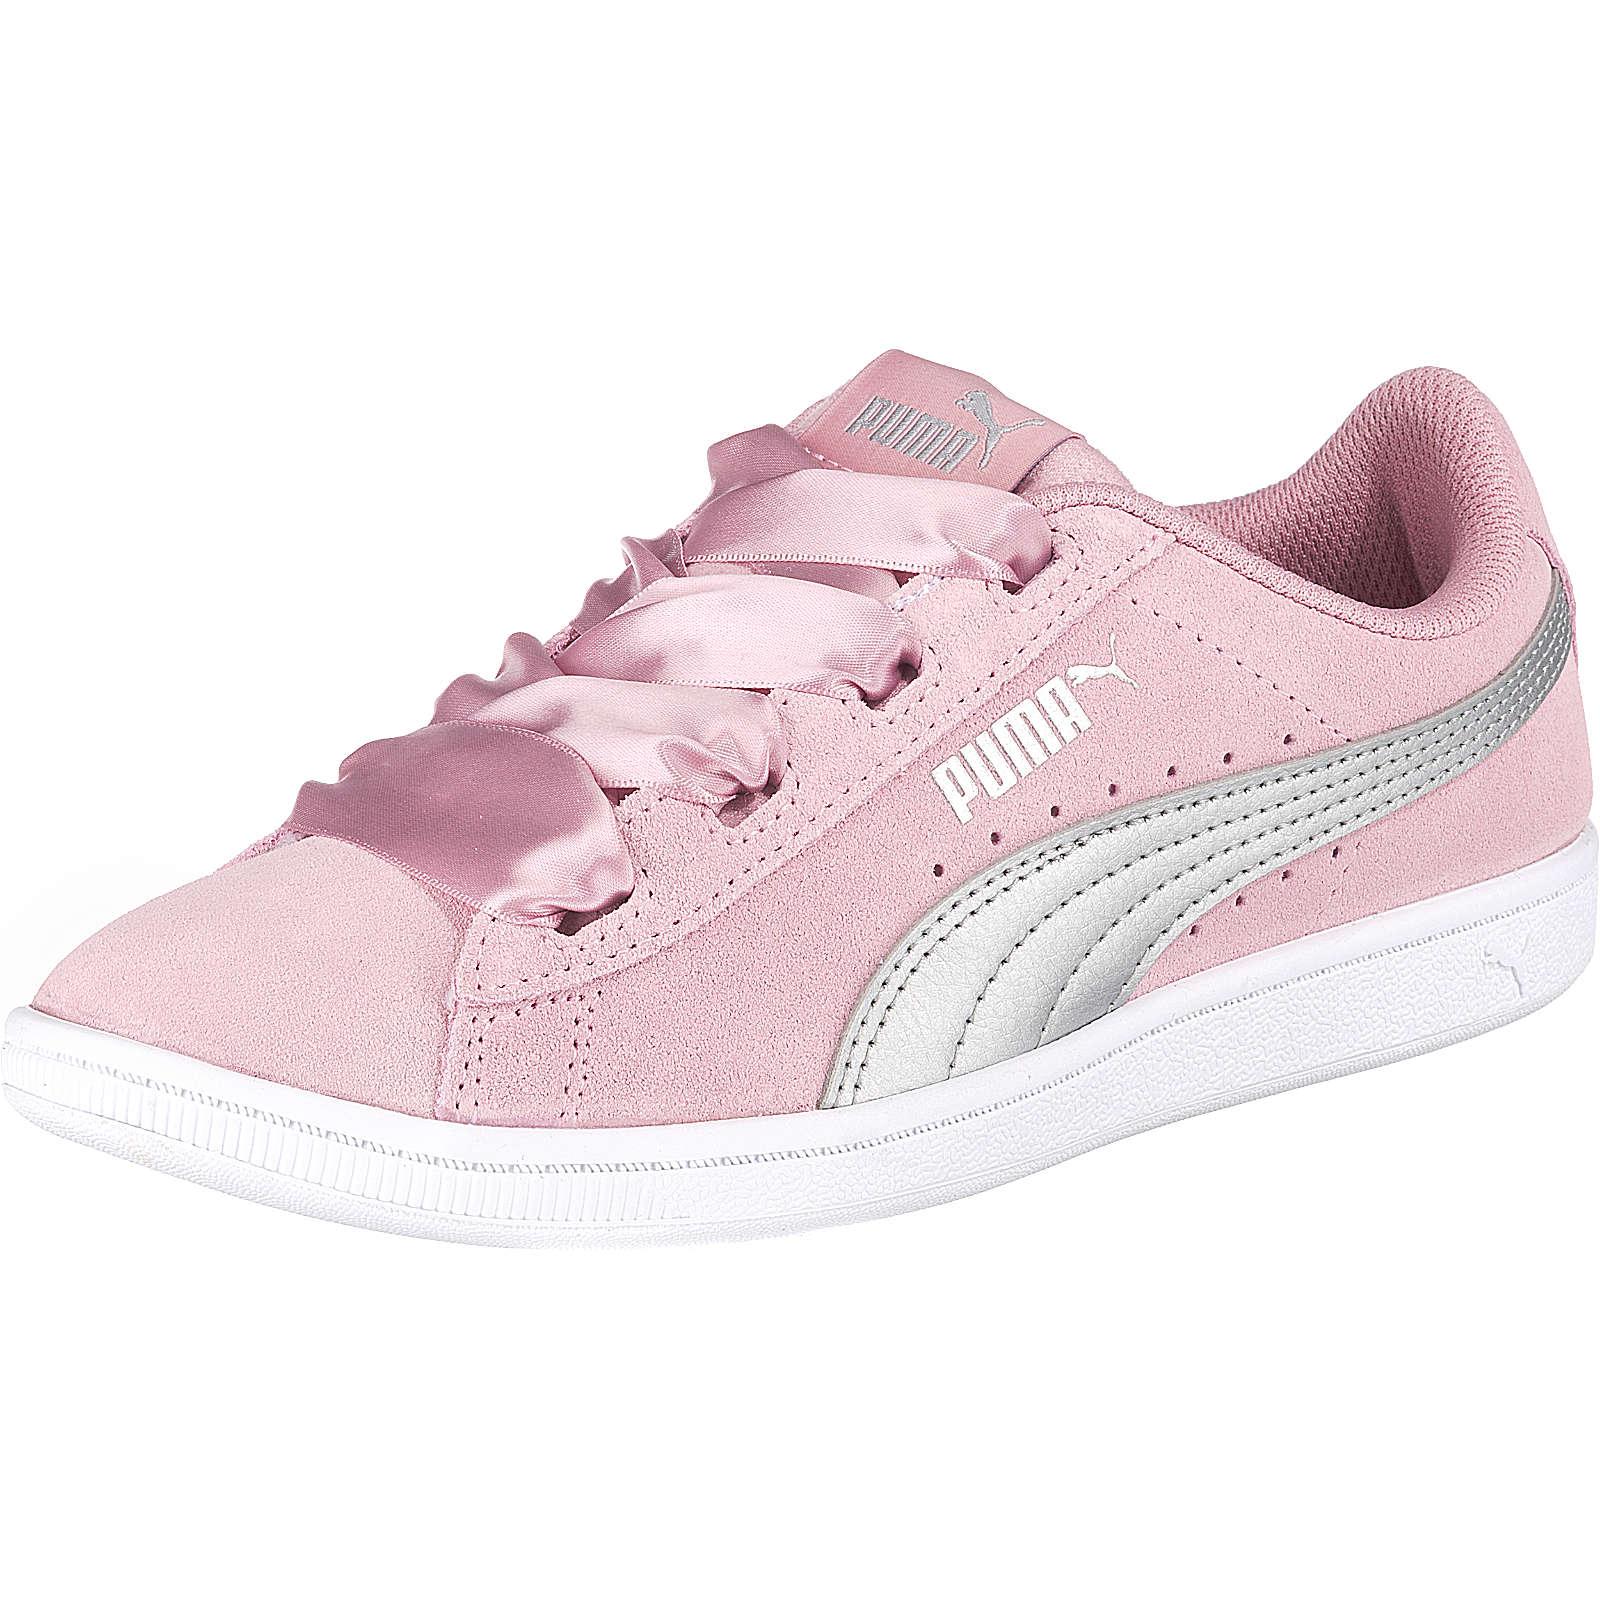 PUMA Sneakers low VIKKY RIBBON JR für Mädchen rosa Mädchen Gr. 37